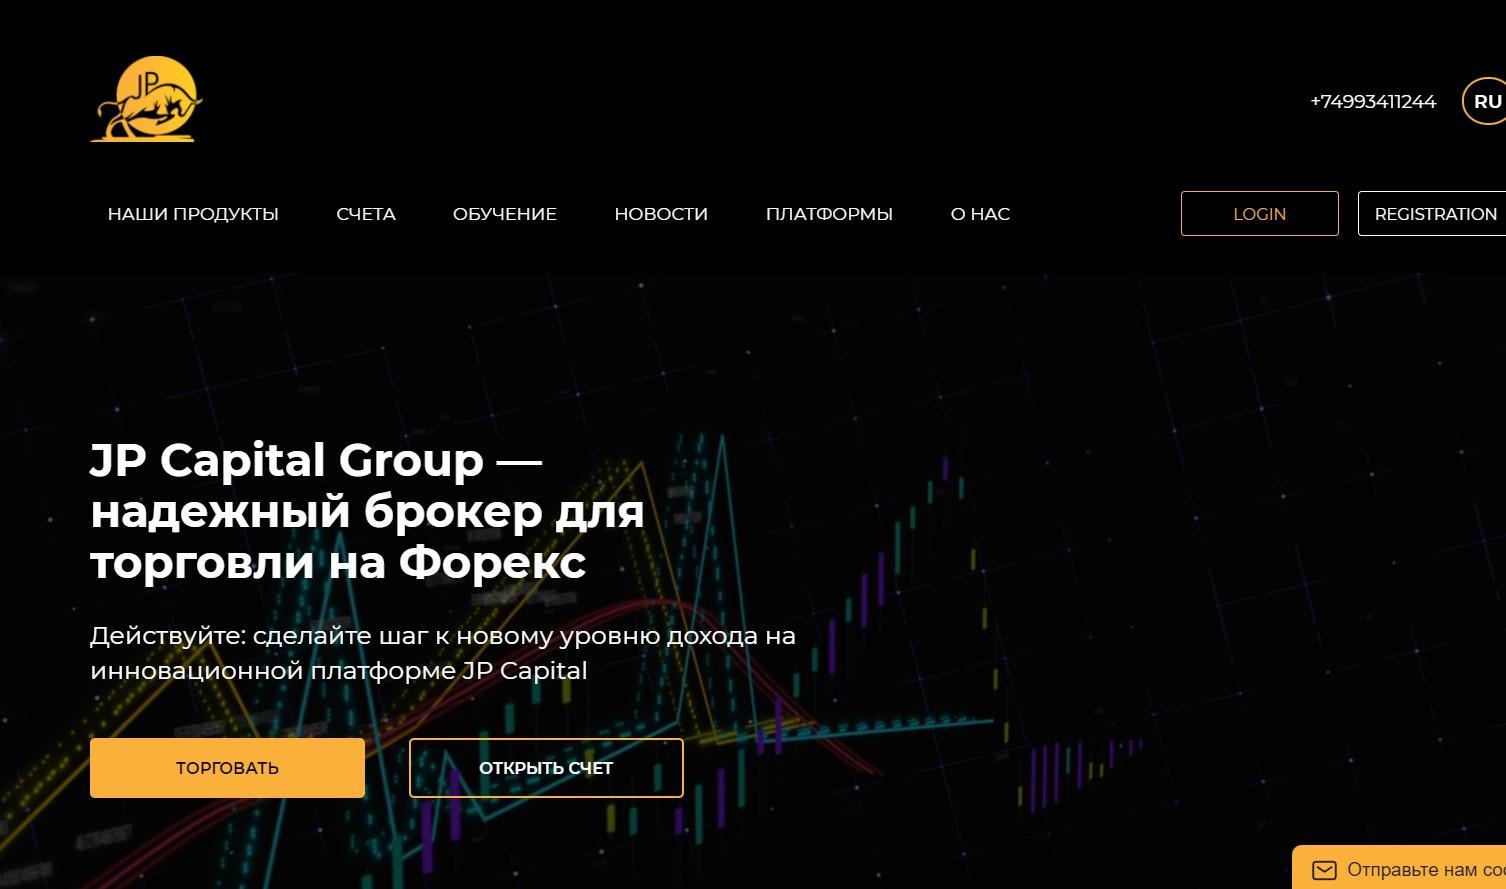 JP Capital Group отзывы